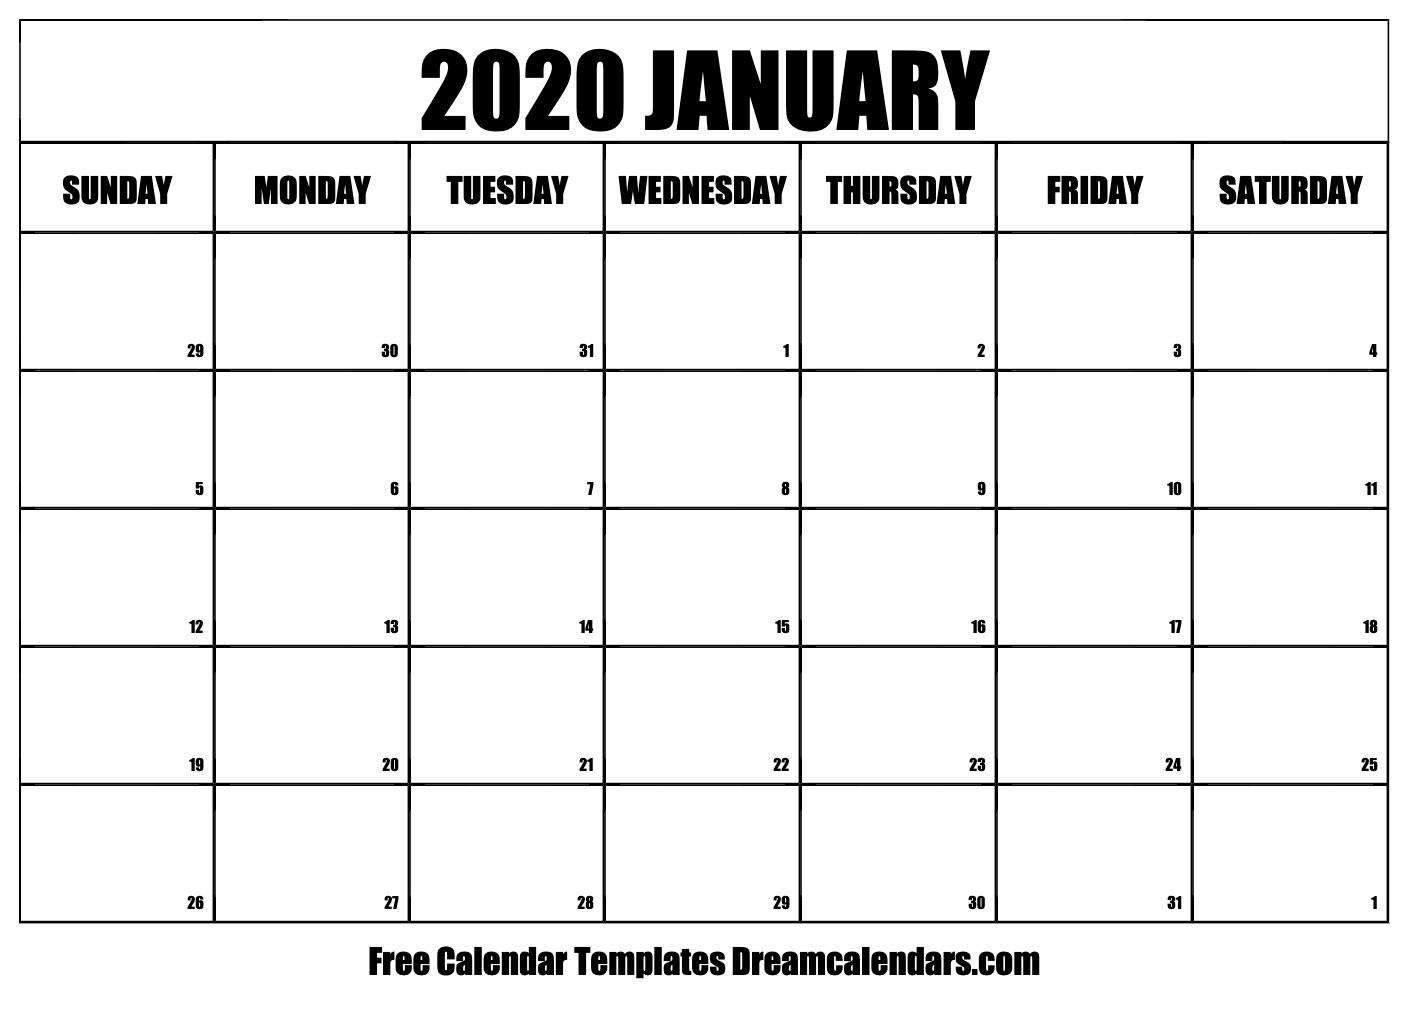 January 2020 Calendar Printable Free Blank January 2020 Printable Calendar